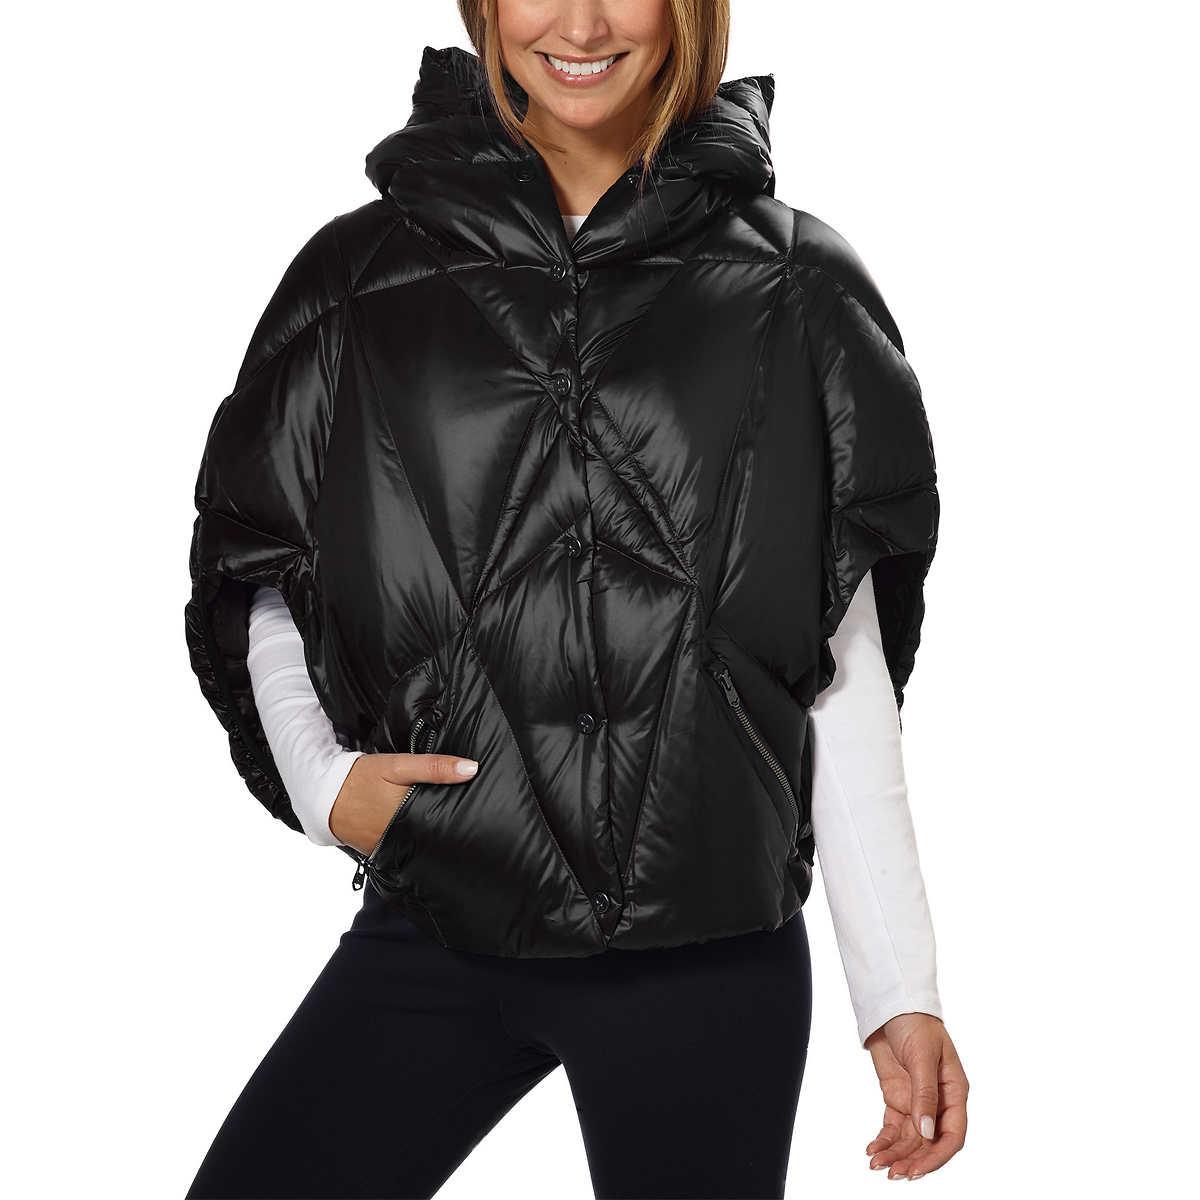 Jackets & Outerwear   Costco